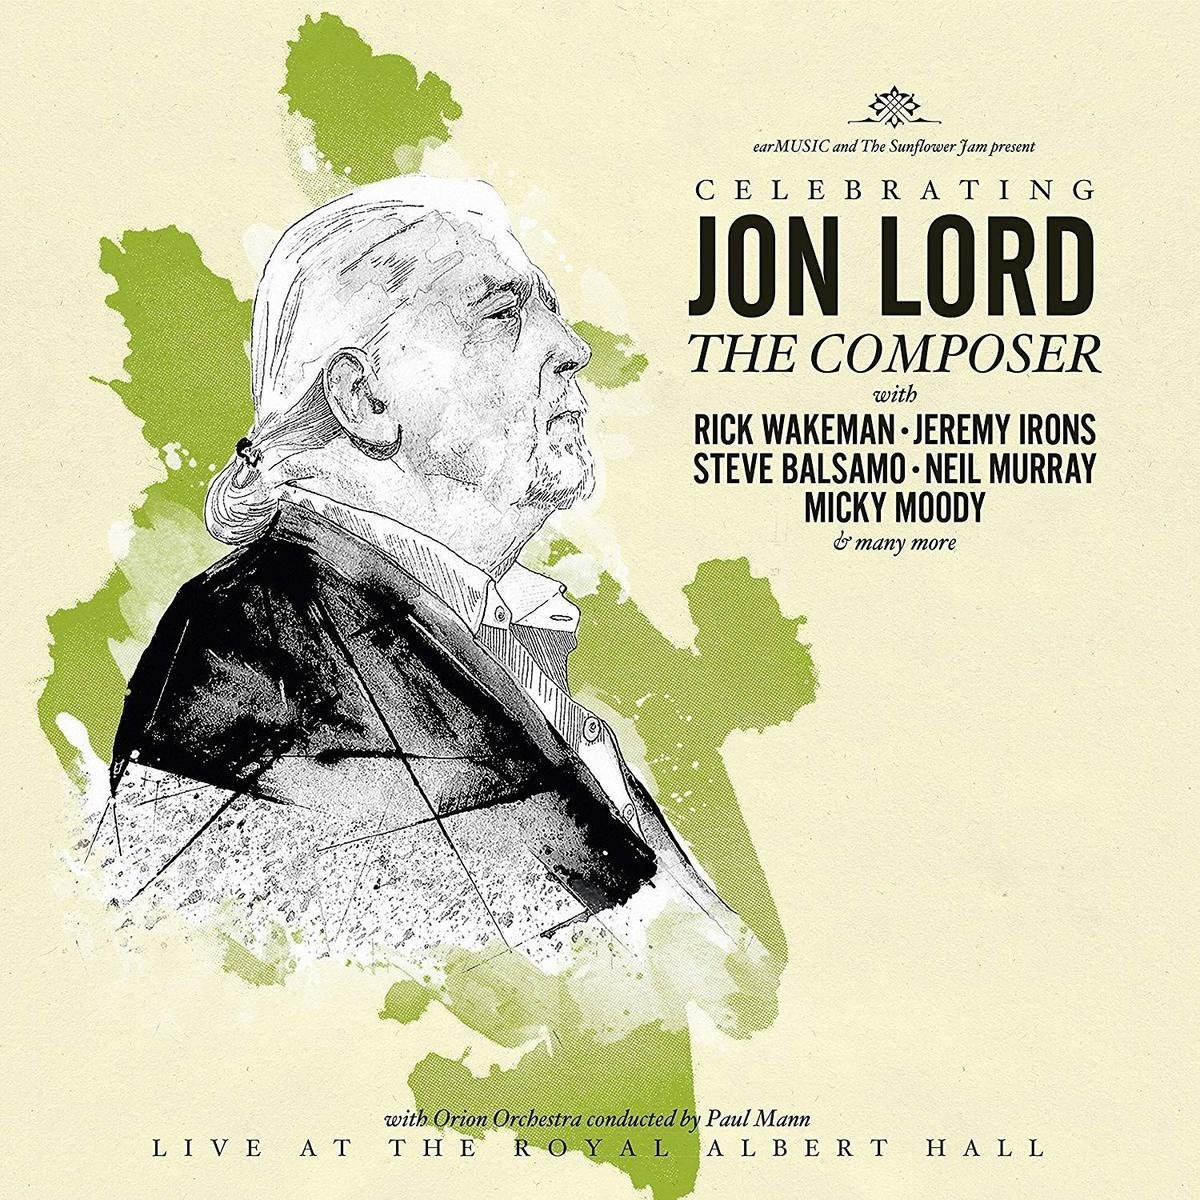 Vinilo : JON LORD, DEEP PURPLE & FRIENDS - Celebrating Jon Lord: The Composer (LP Vinyl)